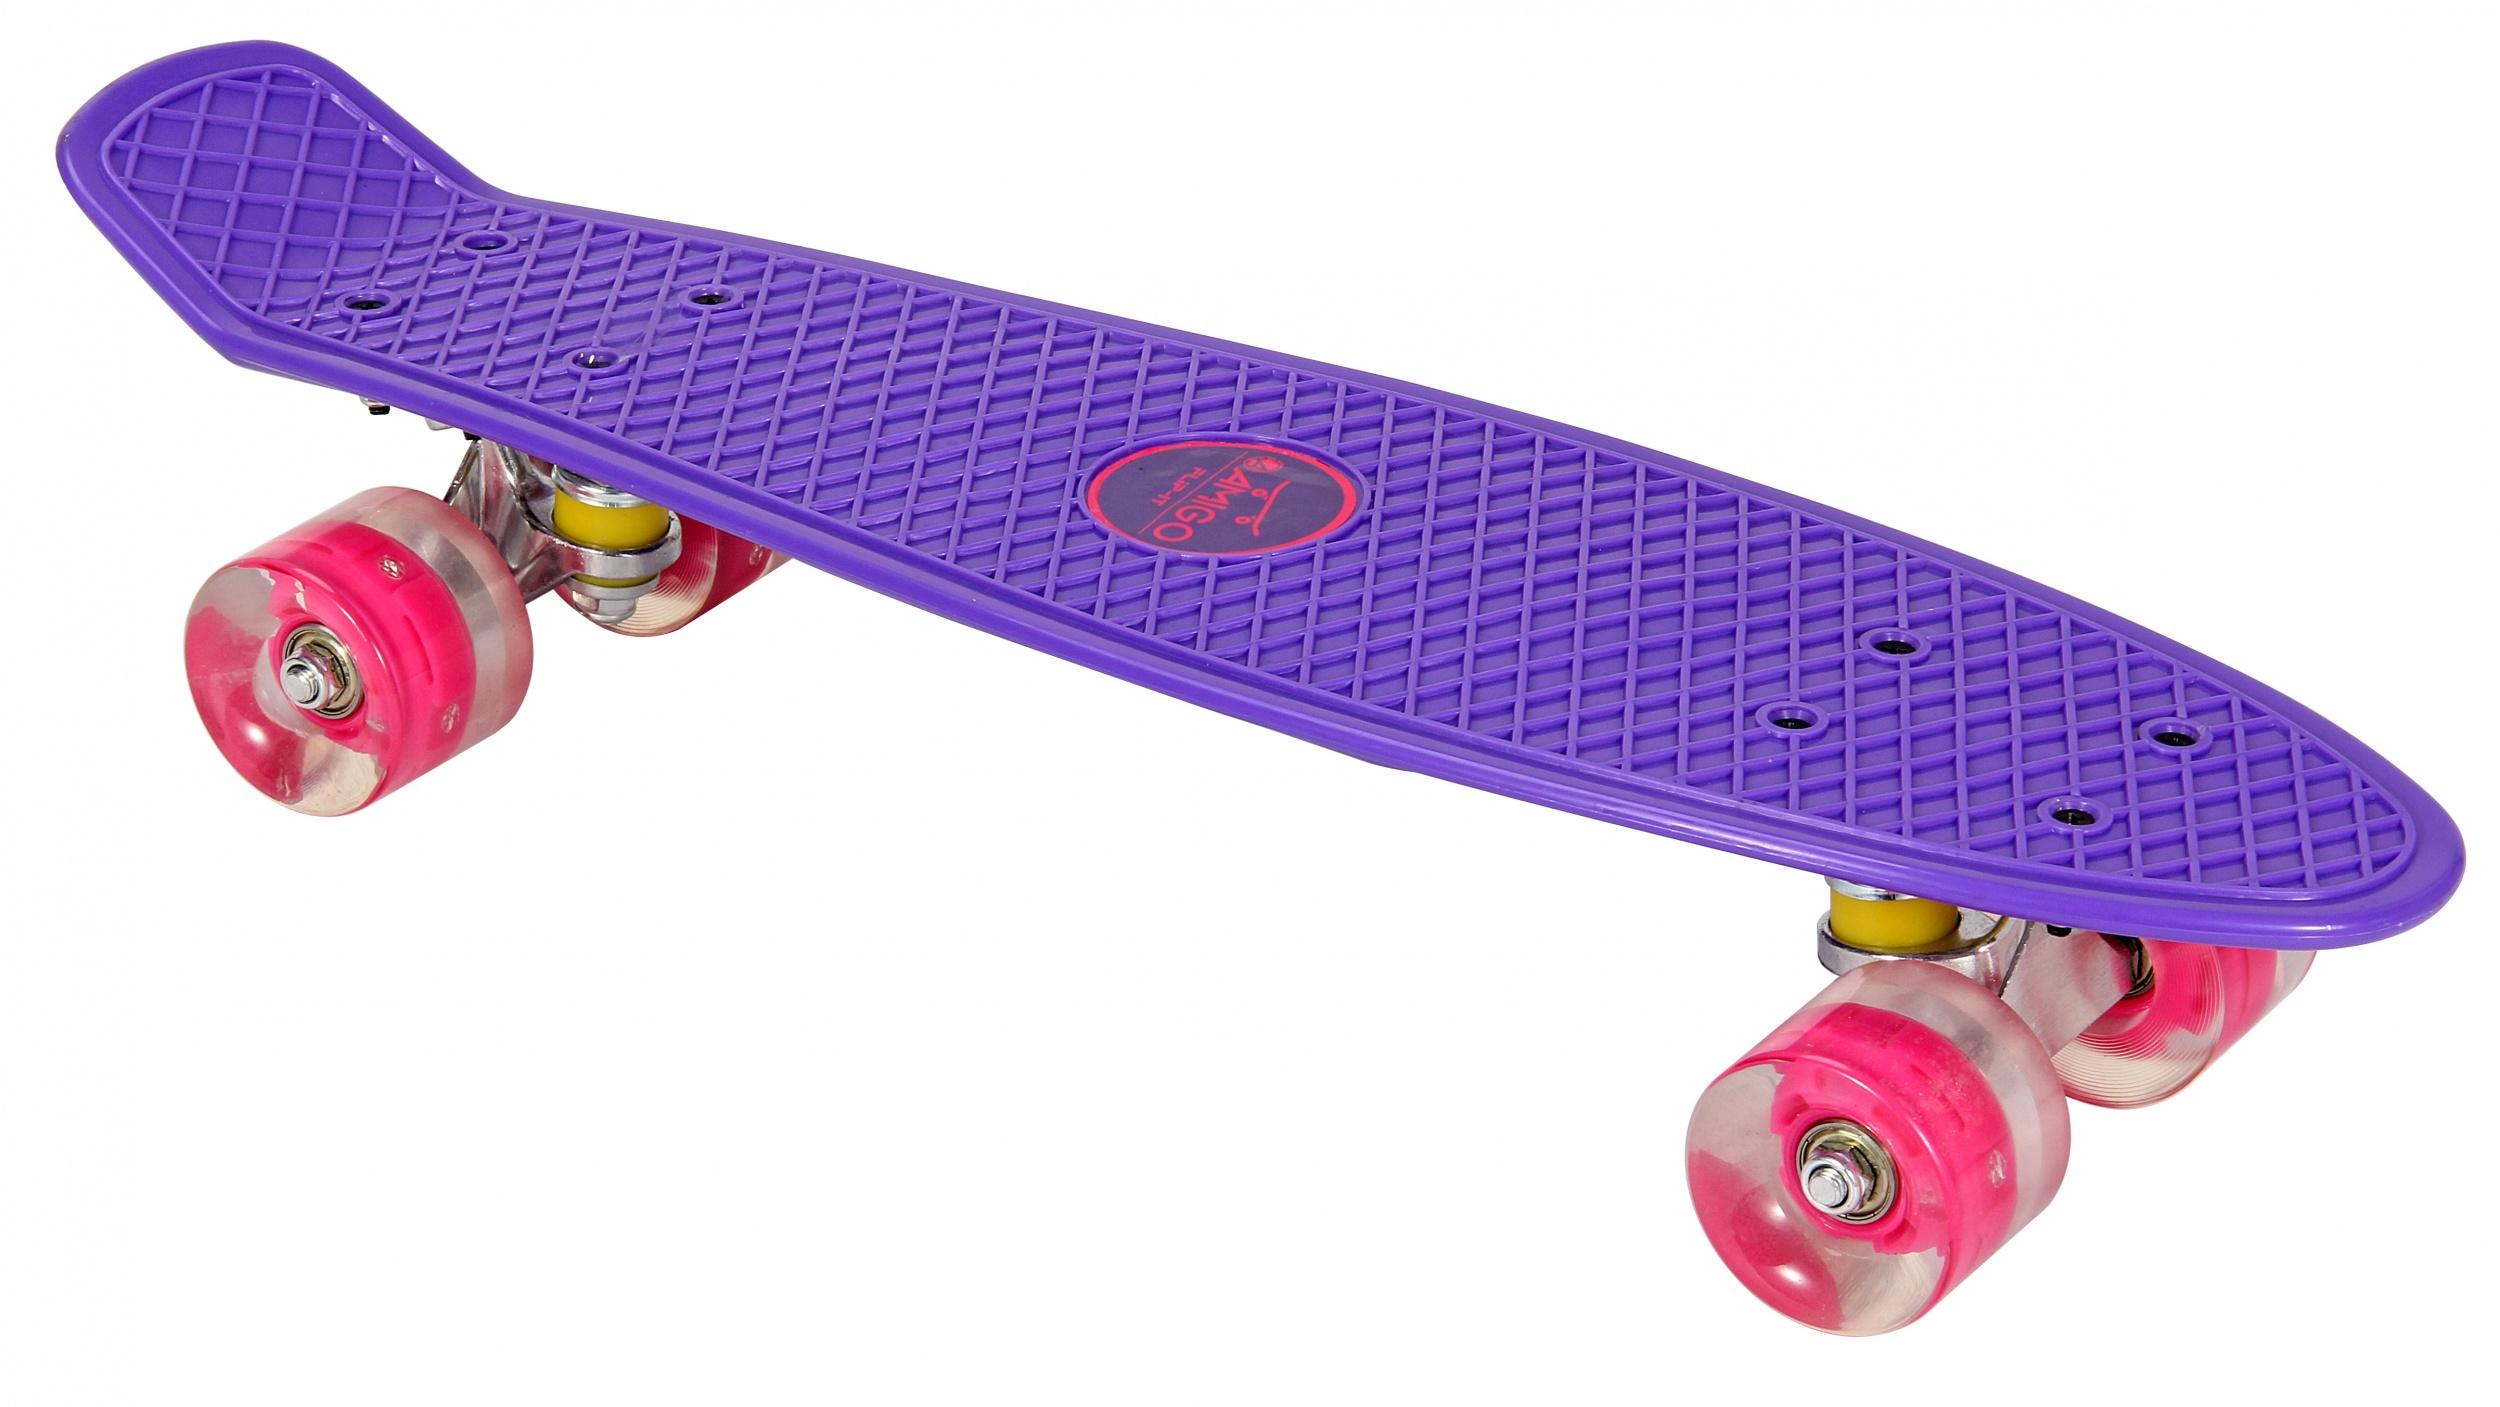 Skateboard met Led-verlichting paars - roze